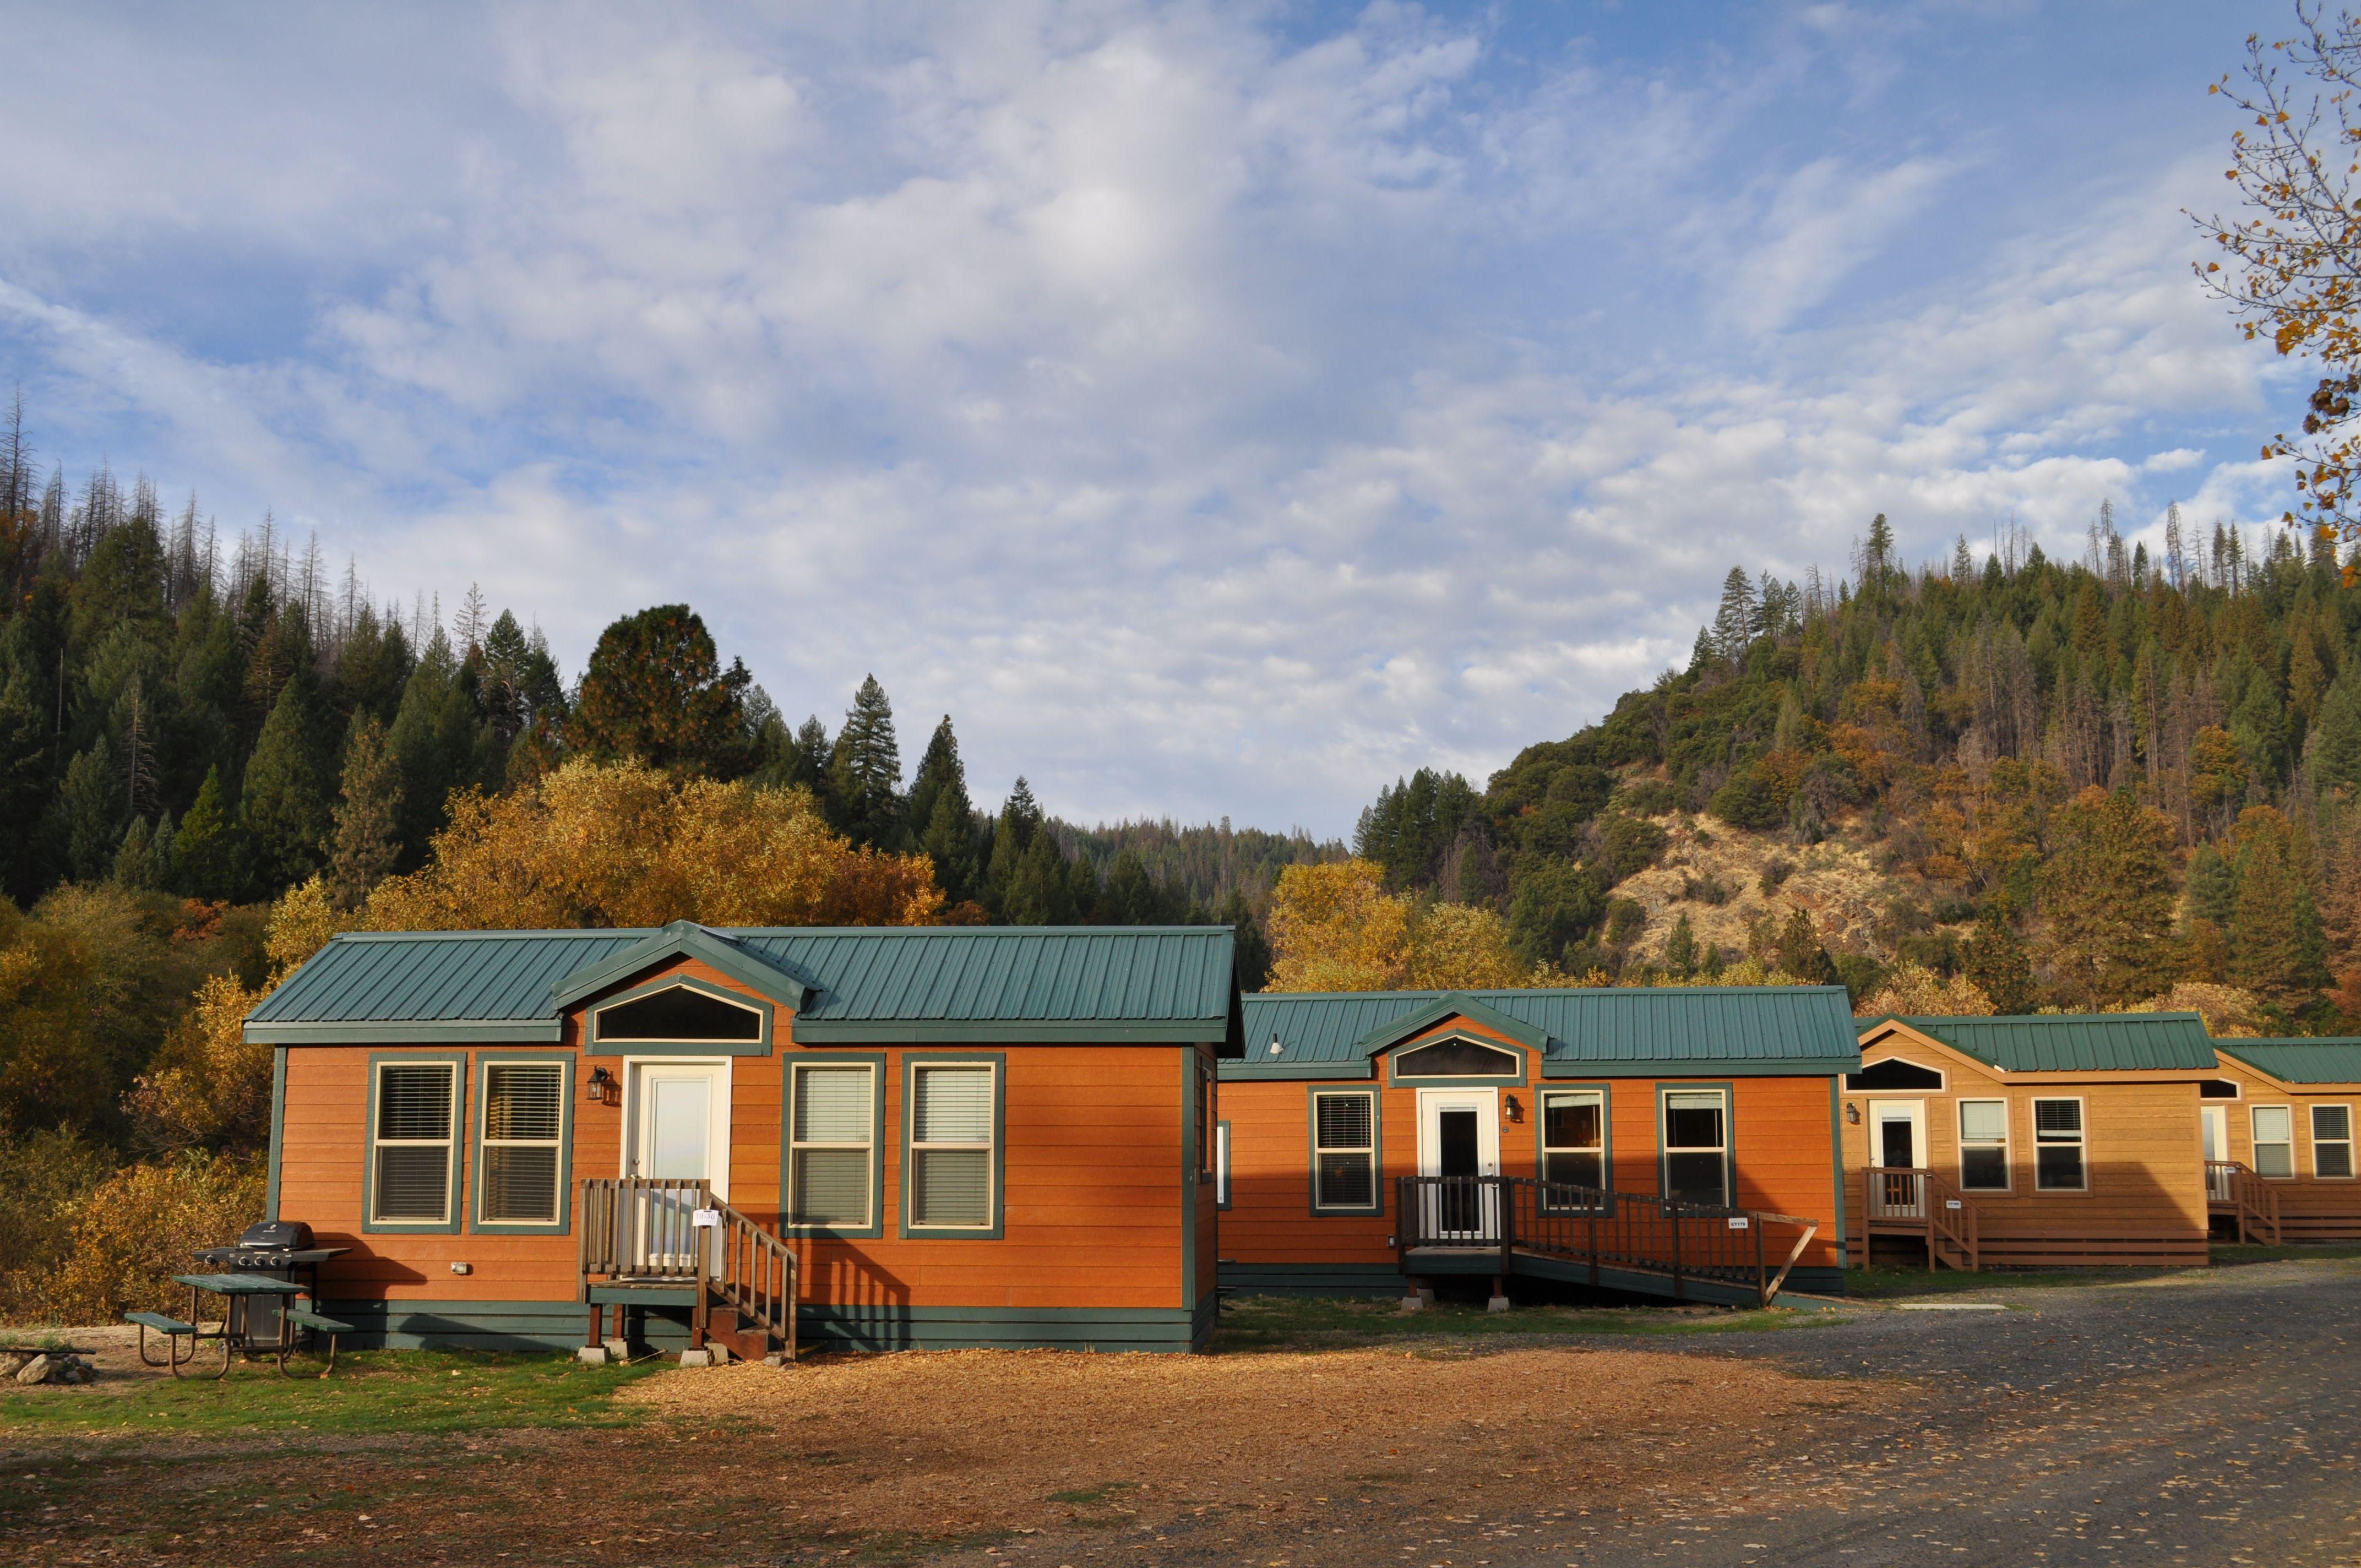 big christmas california cabins cabin in lake rentals bear near rent snow ca for summit rental